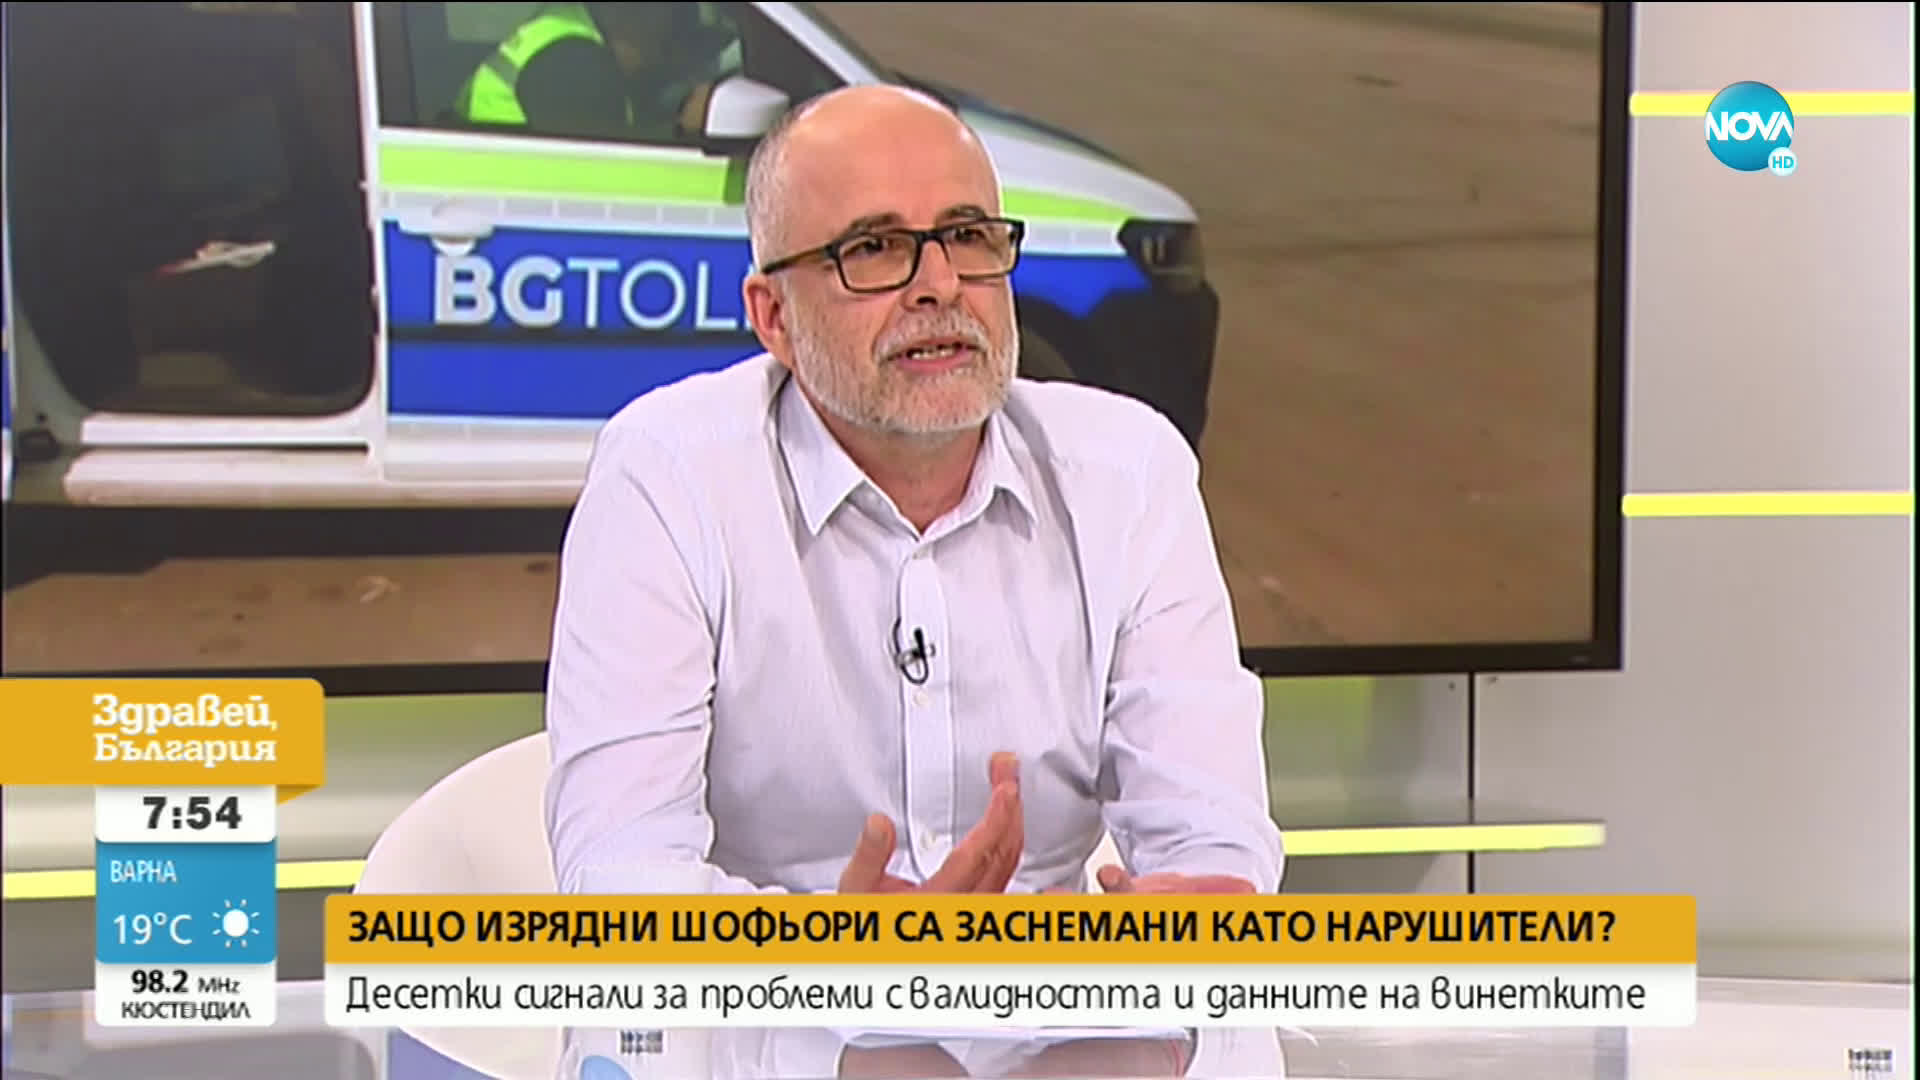 Проф. Олег Асенов: Системата на АПИ работи коректно